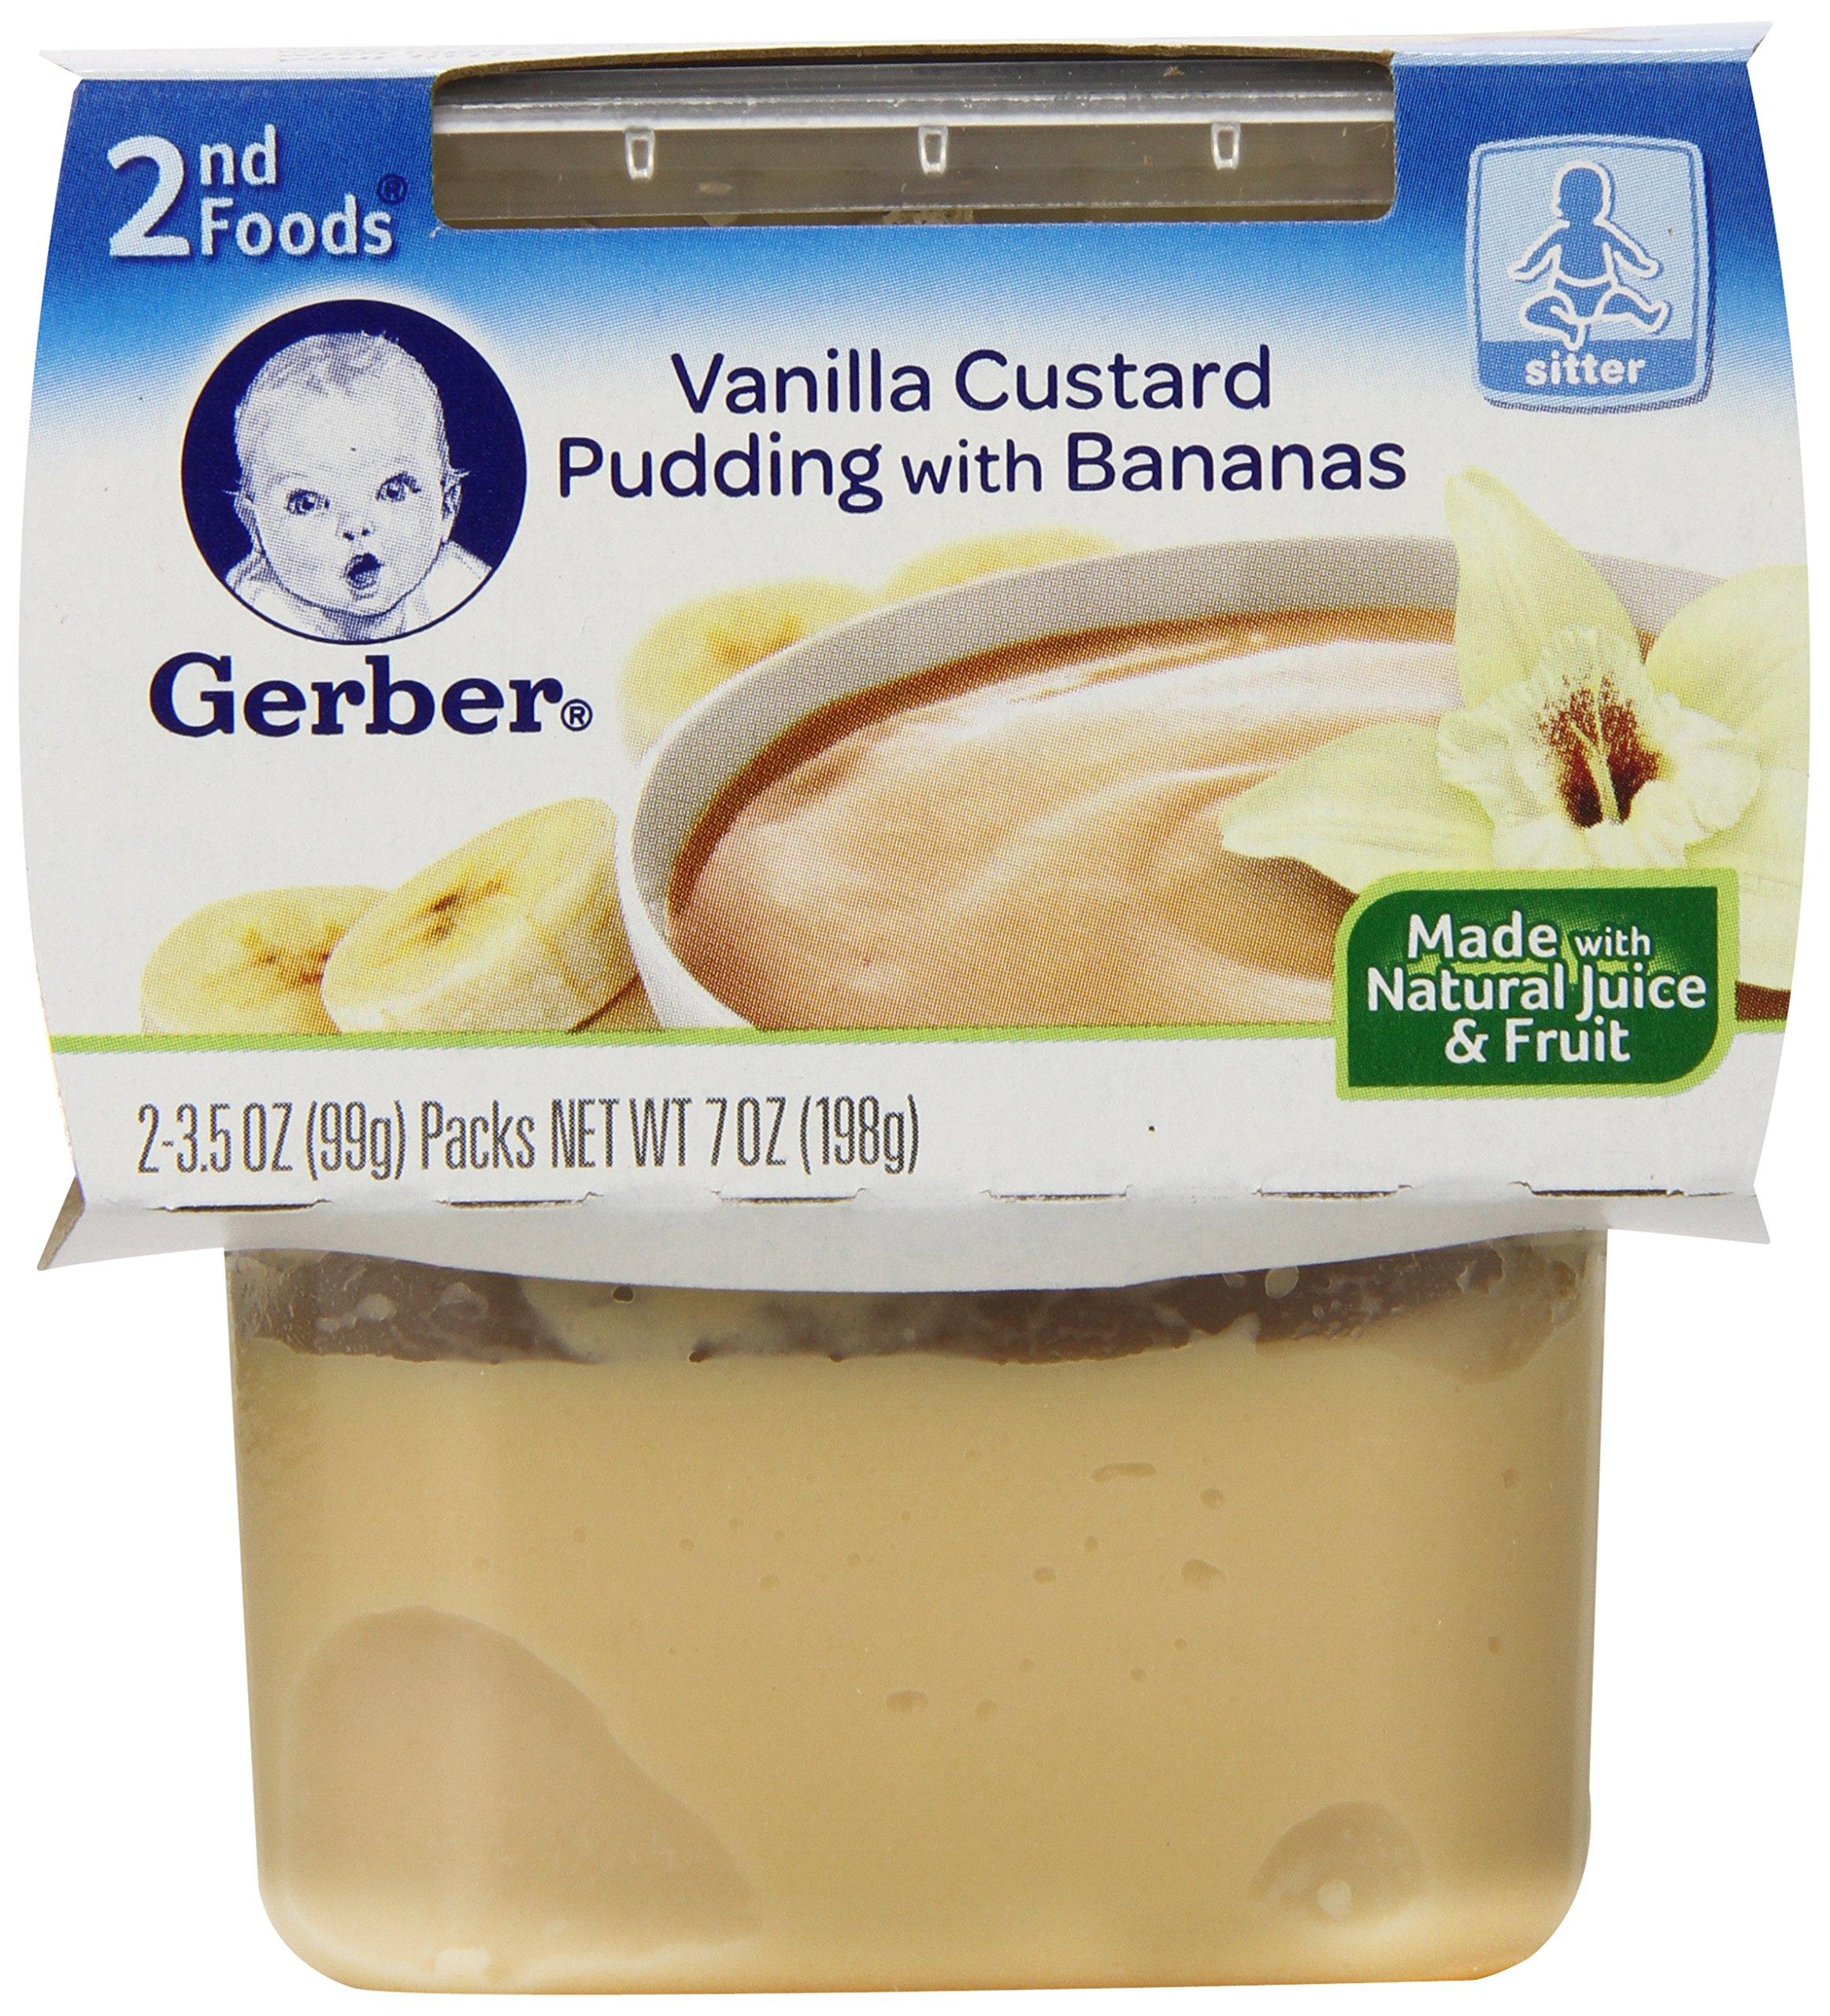 Gerber 2nd Foods Vanilla Custard with Banana, 2 Count (Pack of 8)